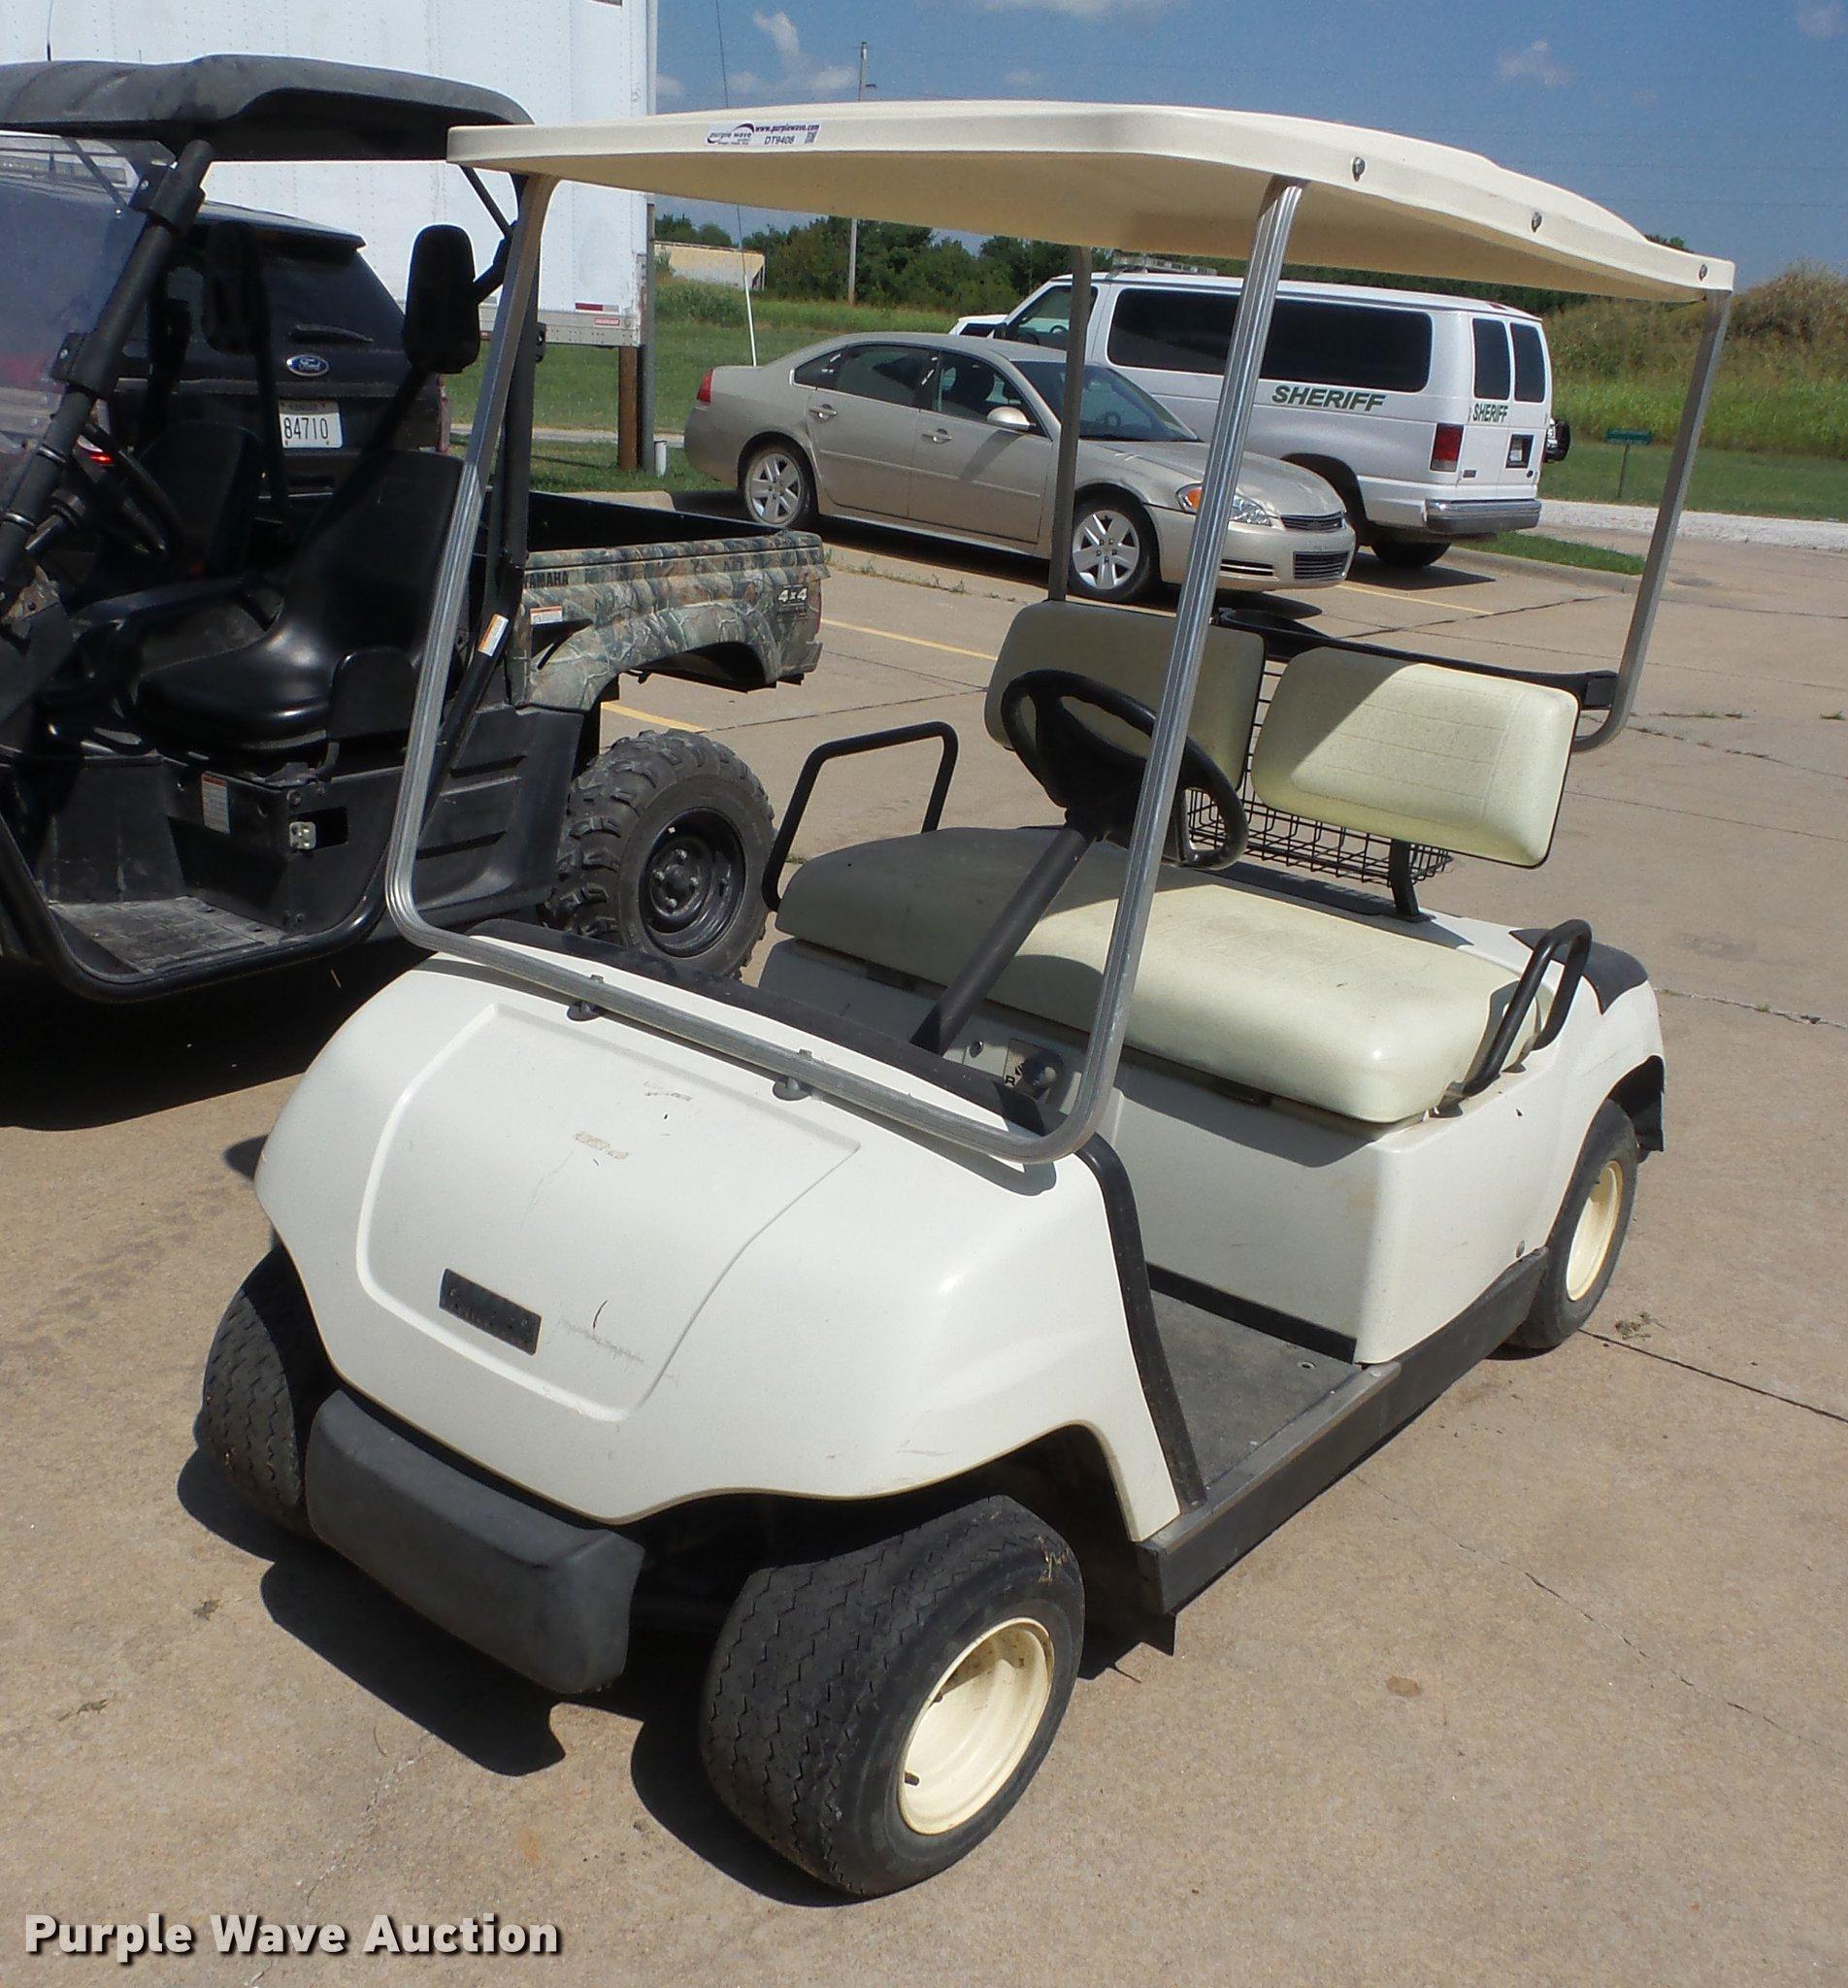 1997 Yamaha G16 Gas Golf Cart Wiring Diagram Elc A Item Sold August 1904x2048